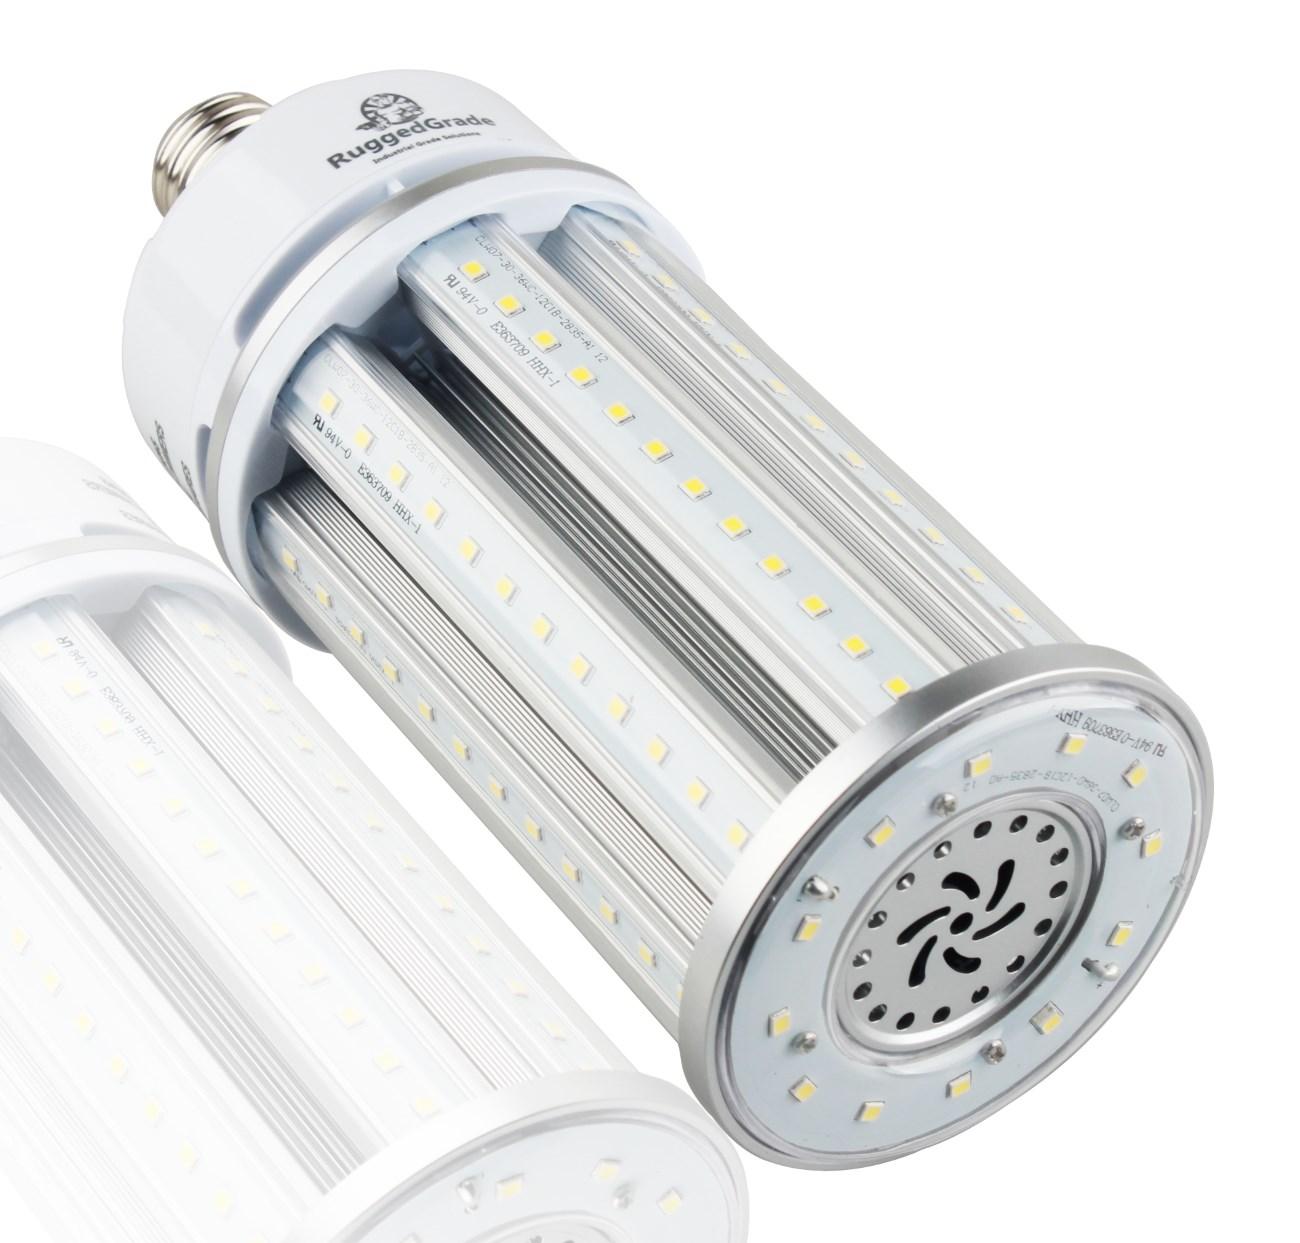 36 Watt Led Corn Light Bulb Standard E26 Base 4600